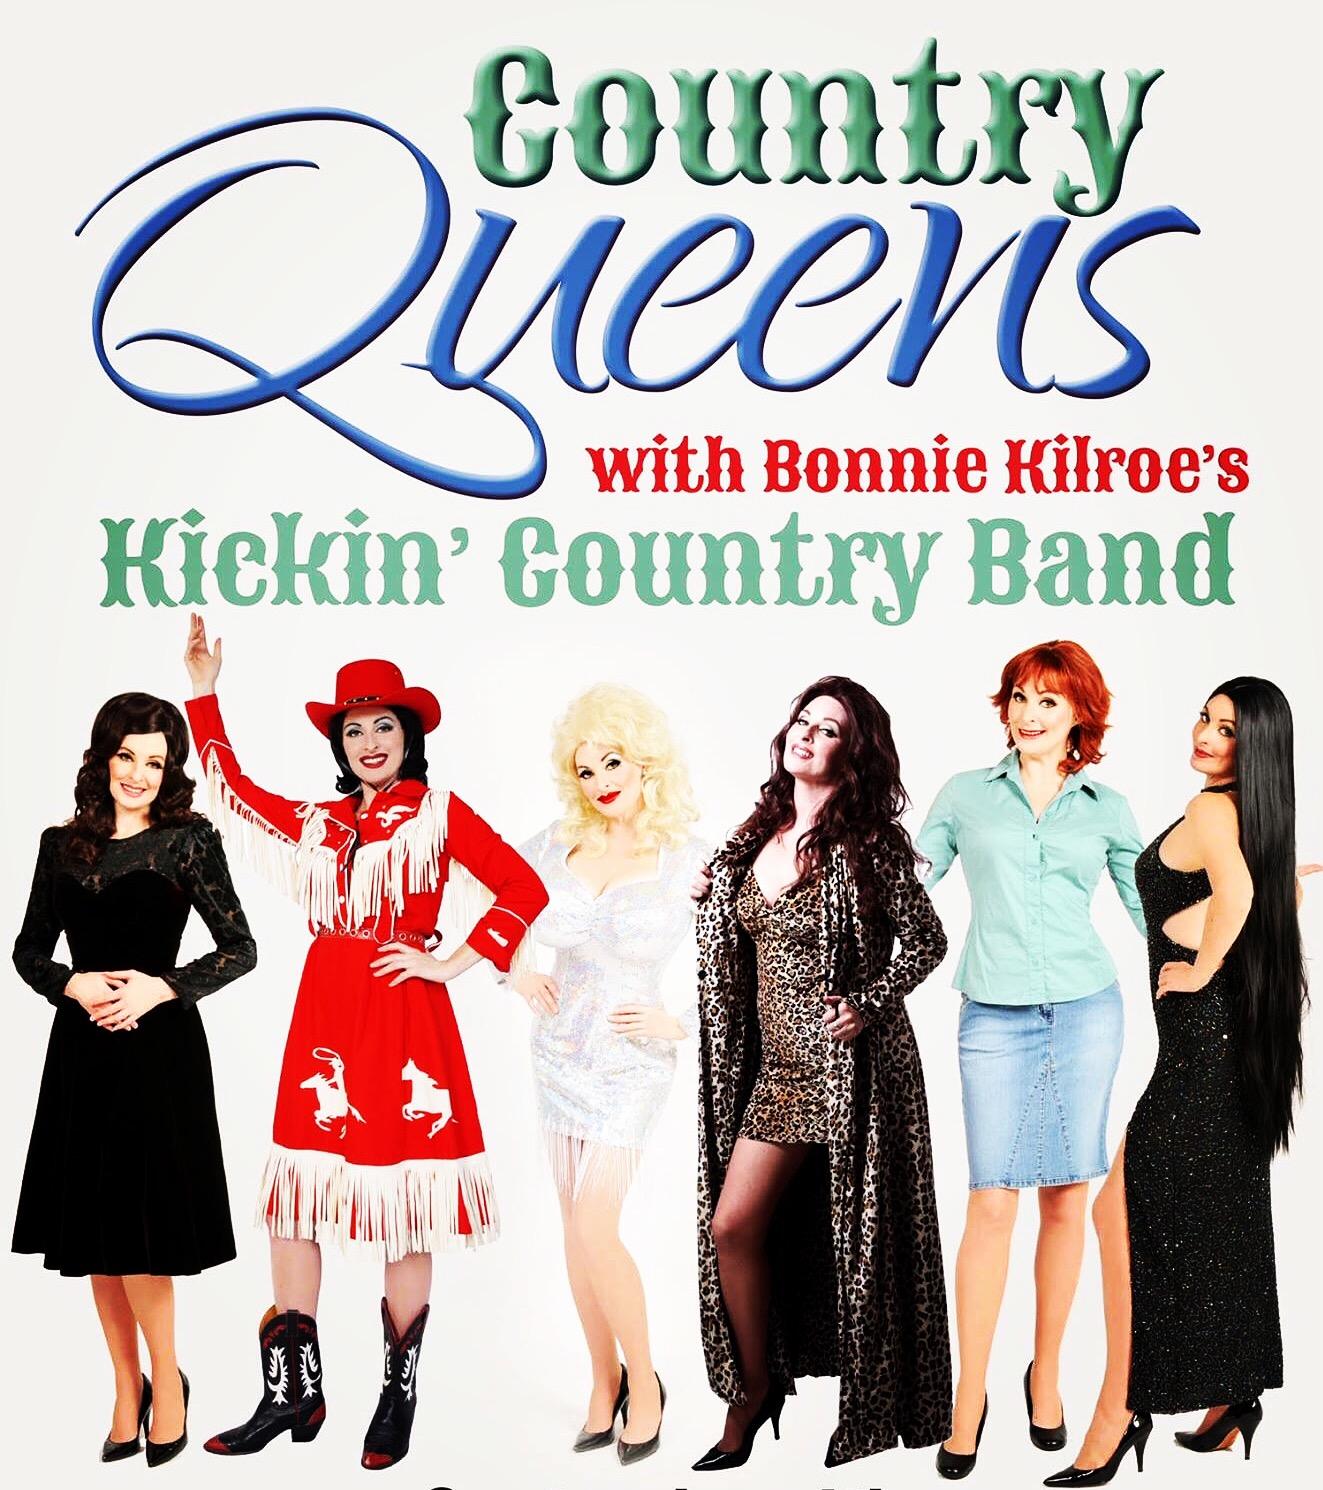 Bonnie Kilroe Country Queens Vancouver